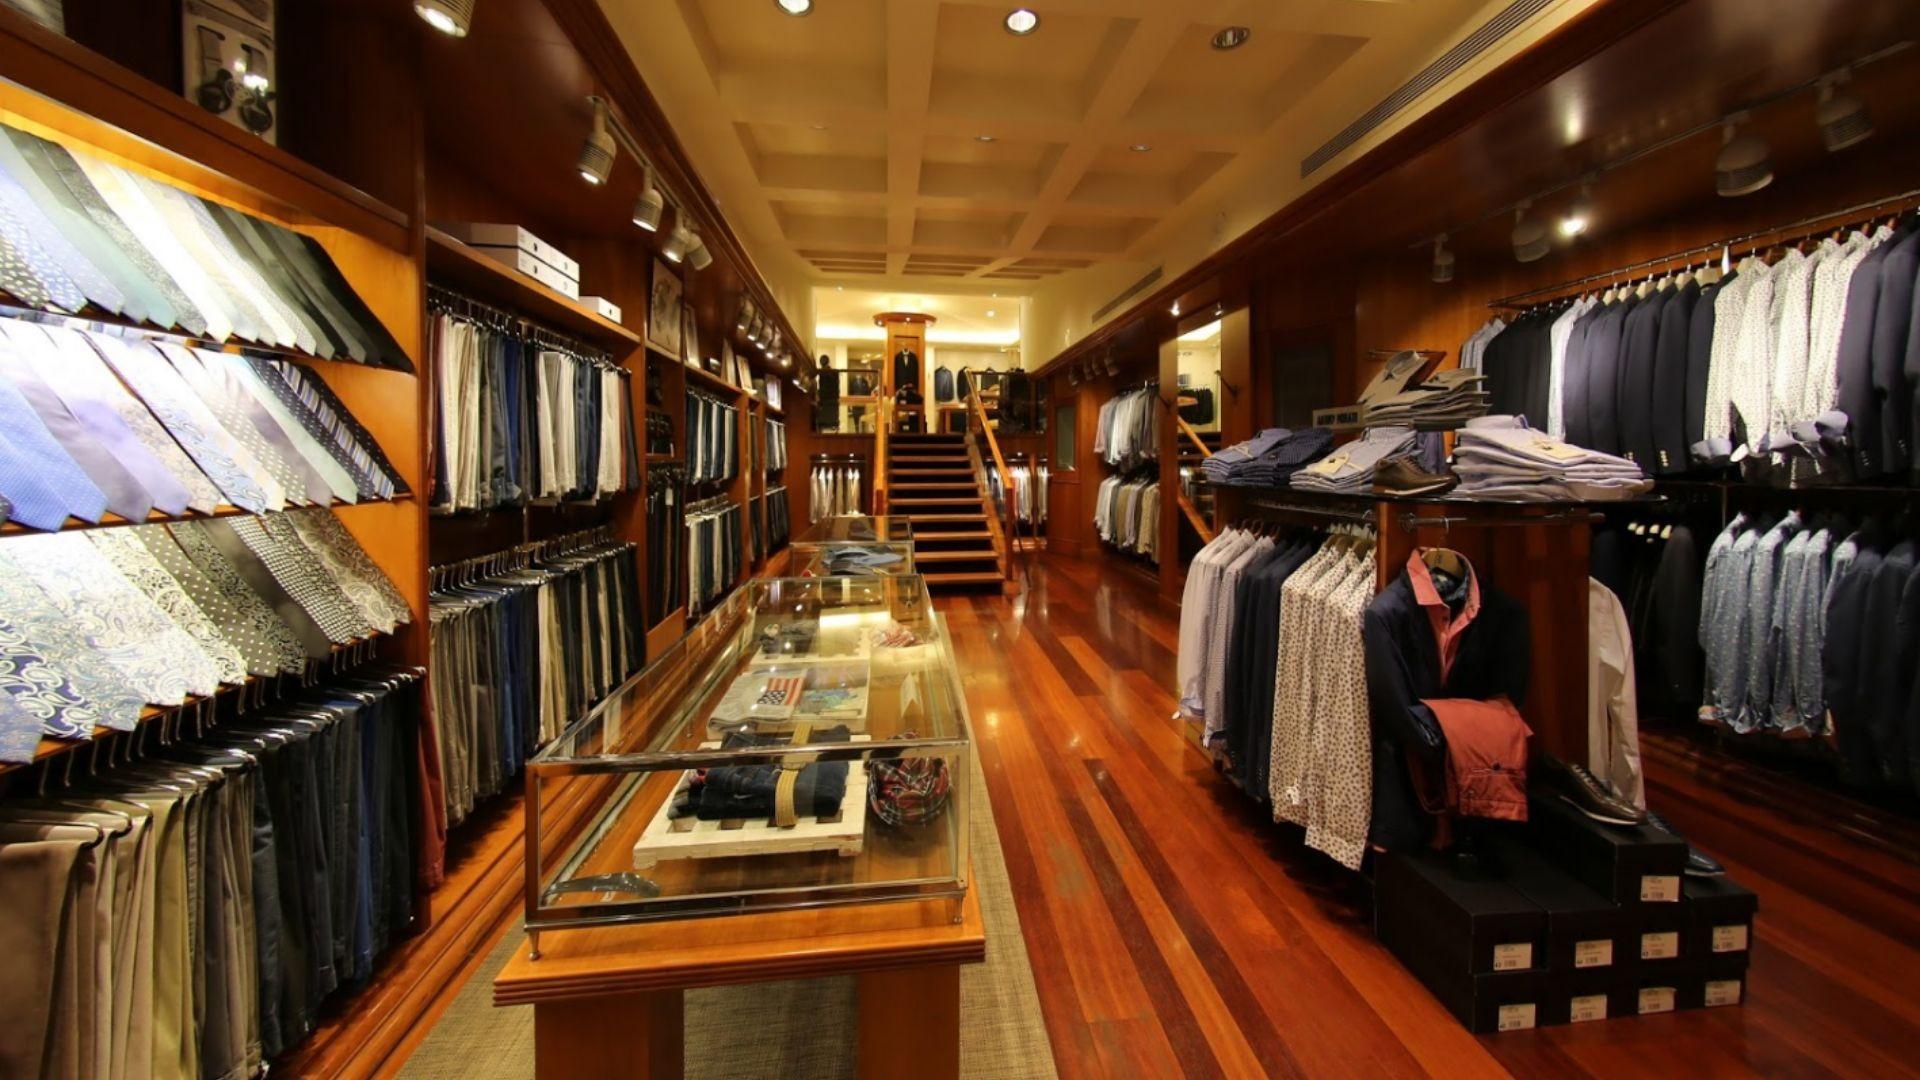 Tienda de ropa masculina en Reus